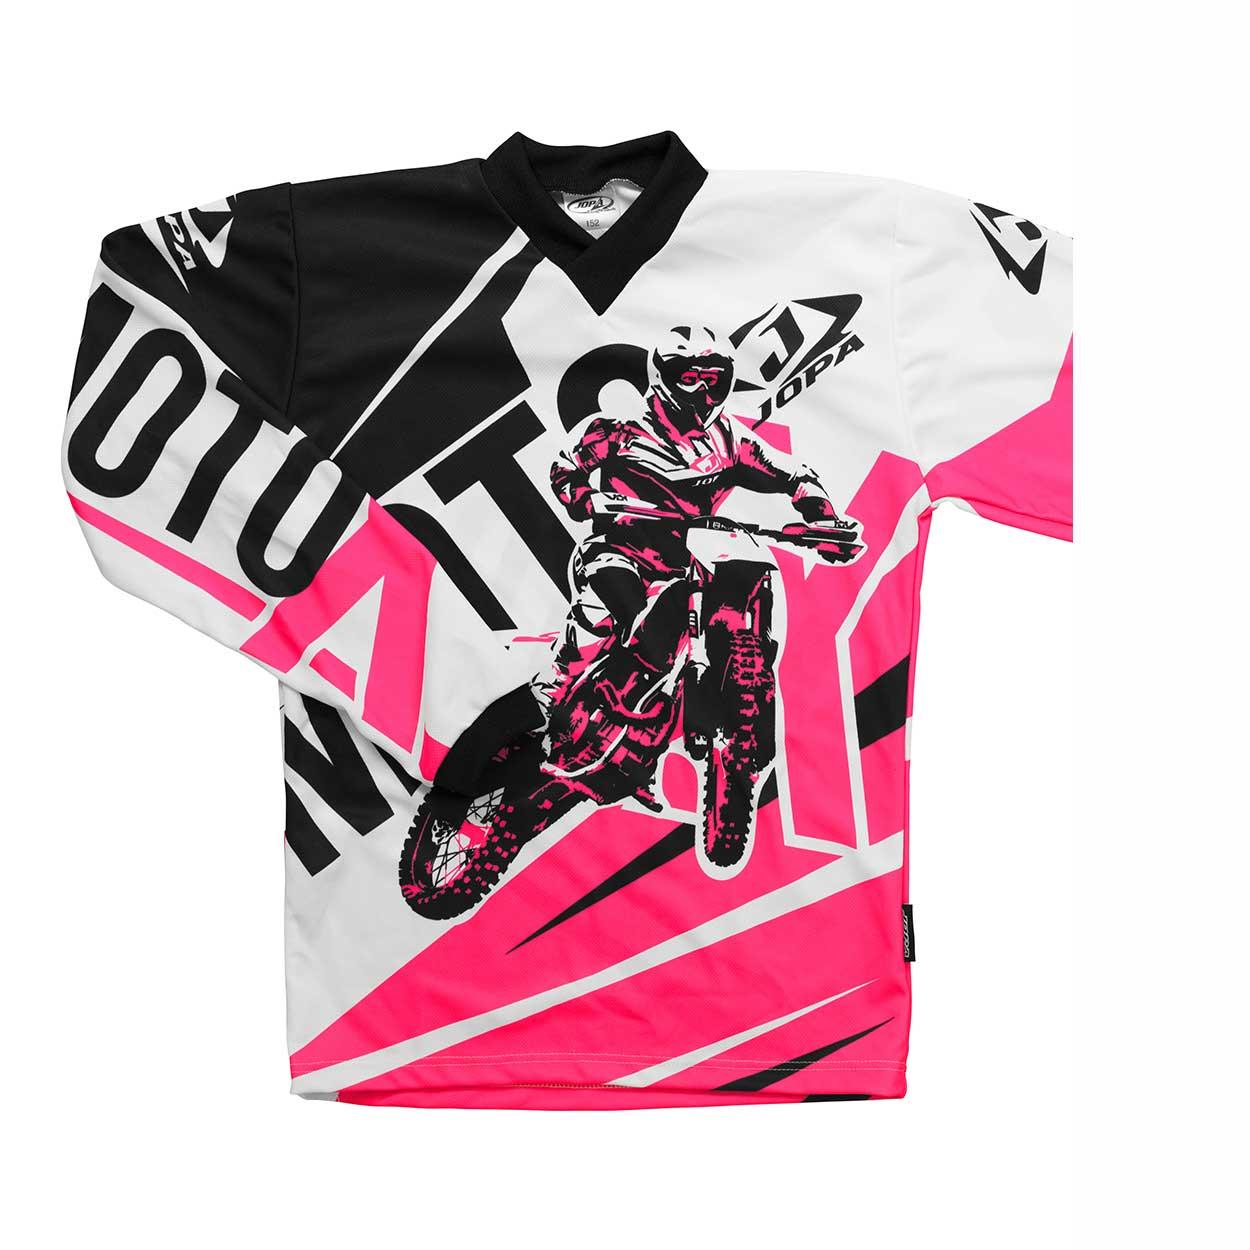 Jopa Kinder Shirt Moto-X Pink-86